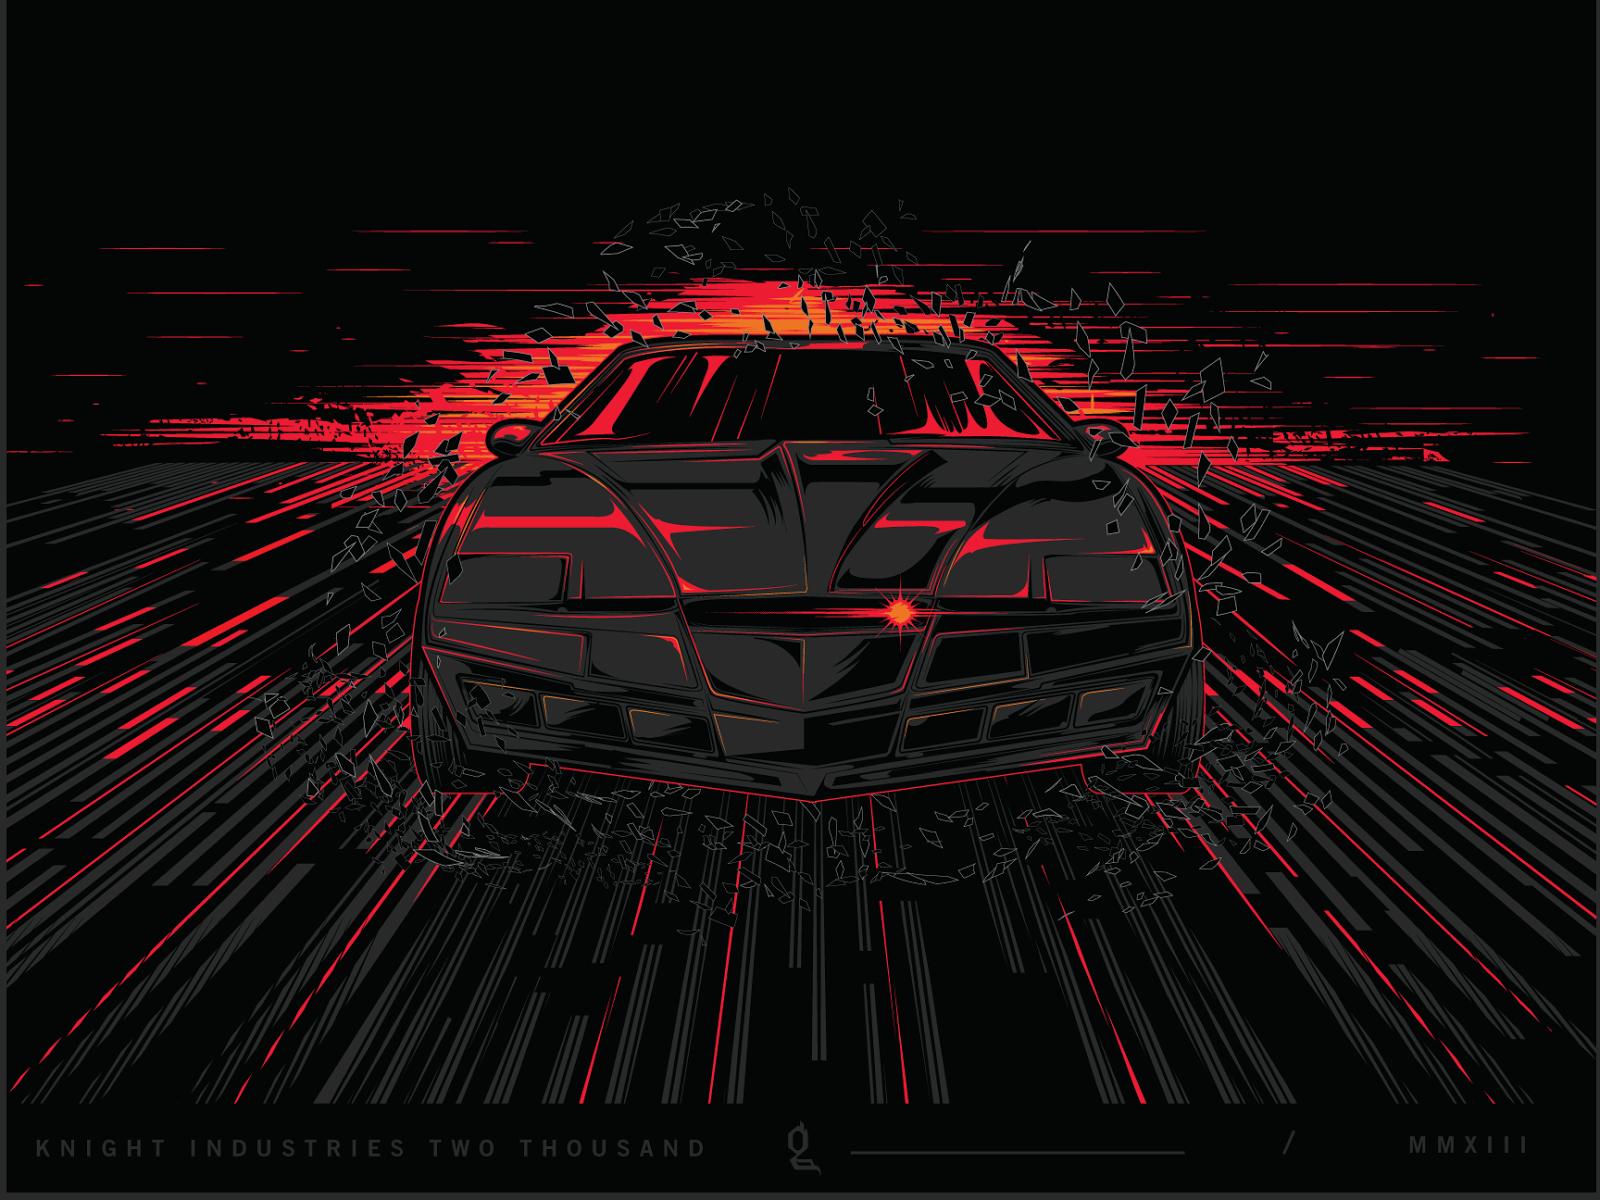 Free Knight Rider Live Wallpaper - WallpaperSafari